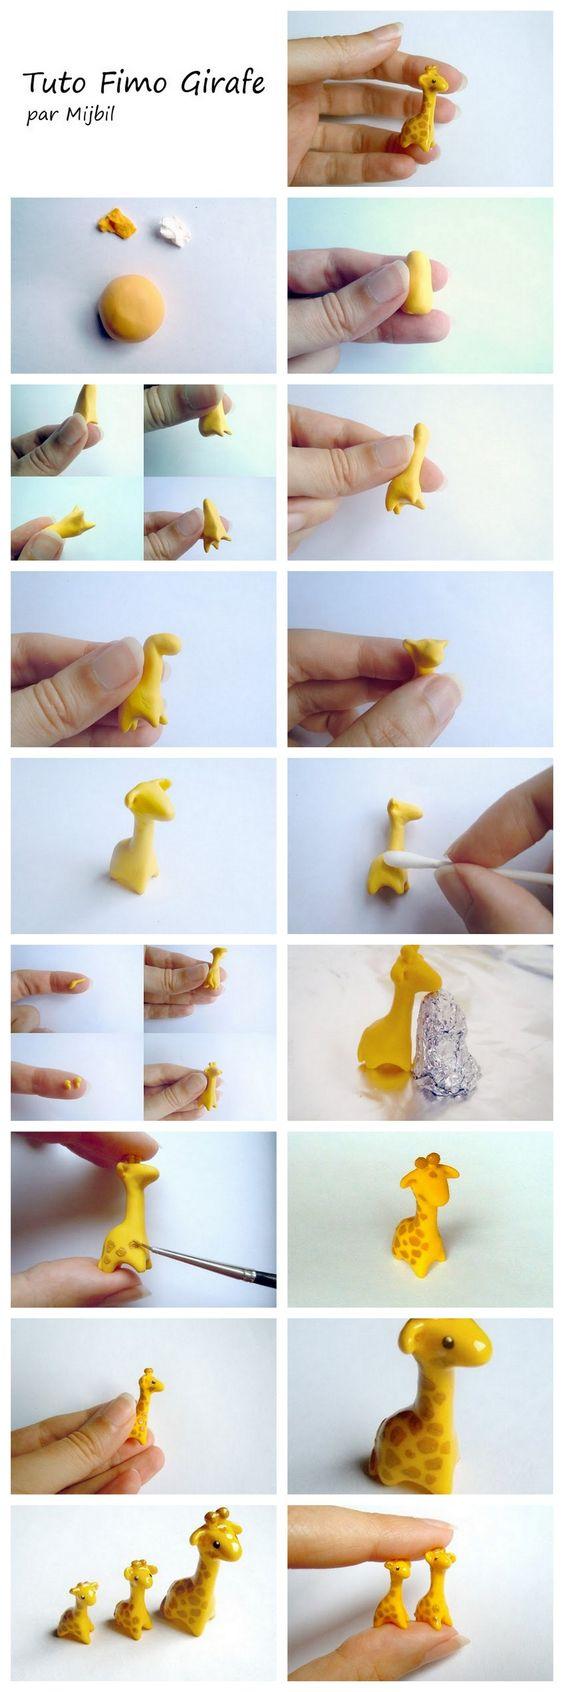 Fimo or Polymer Clay Giraffe Tutorial: